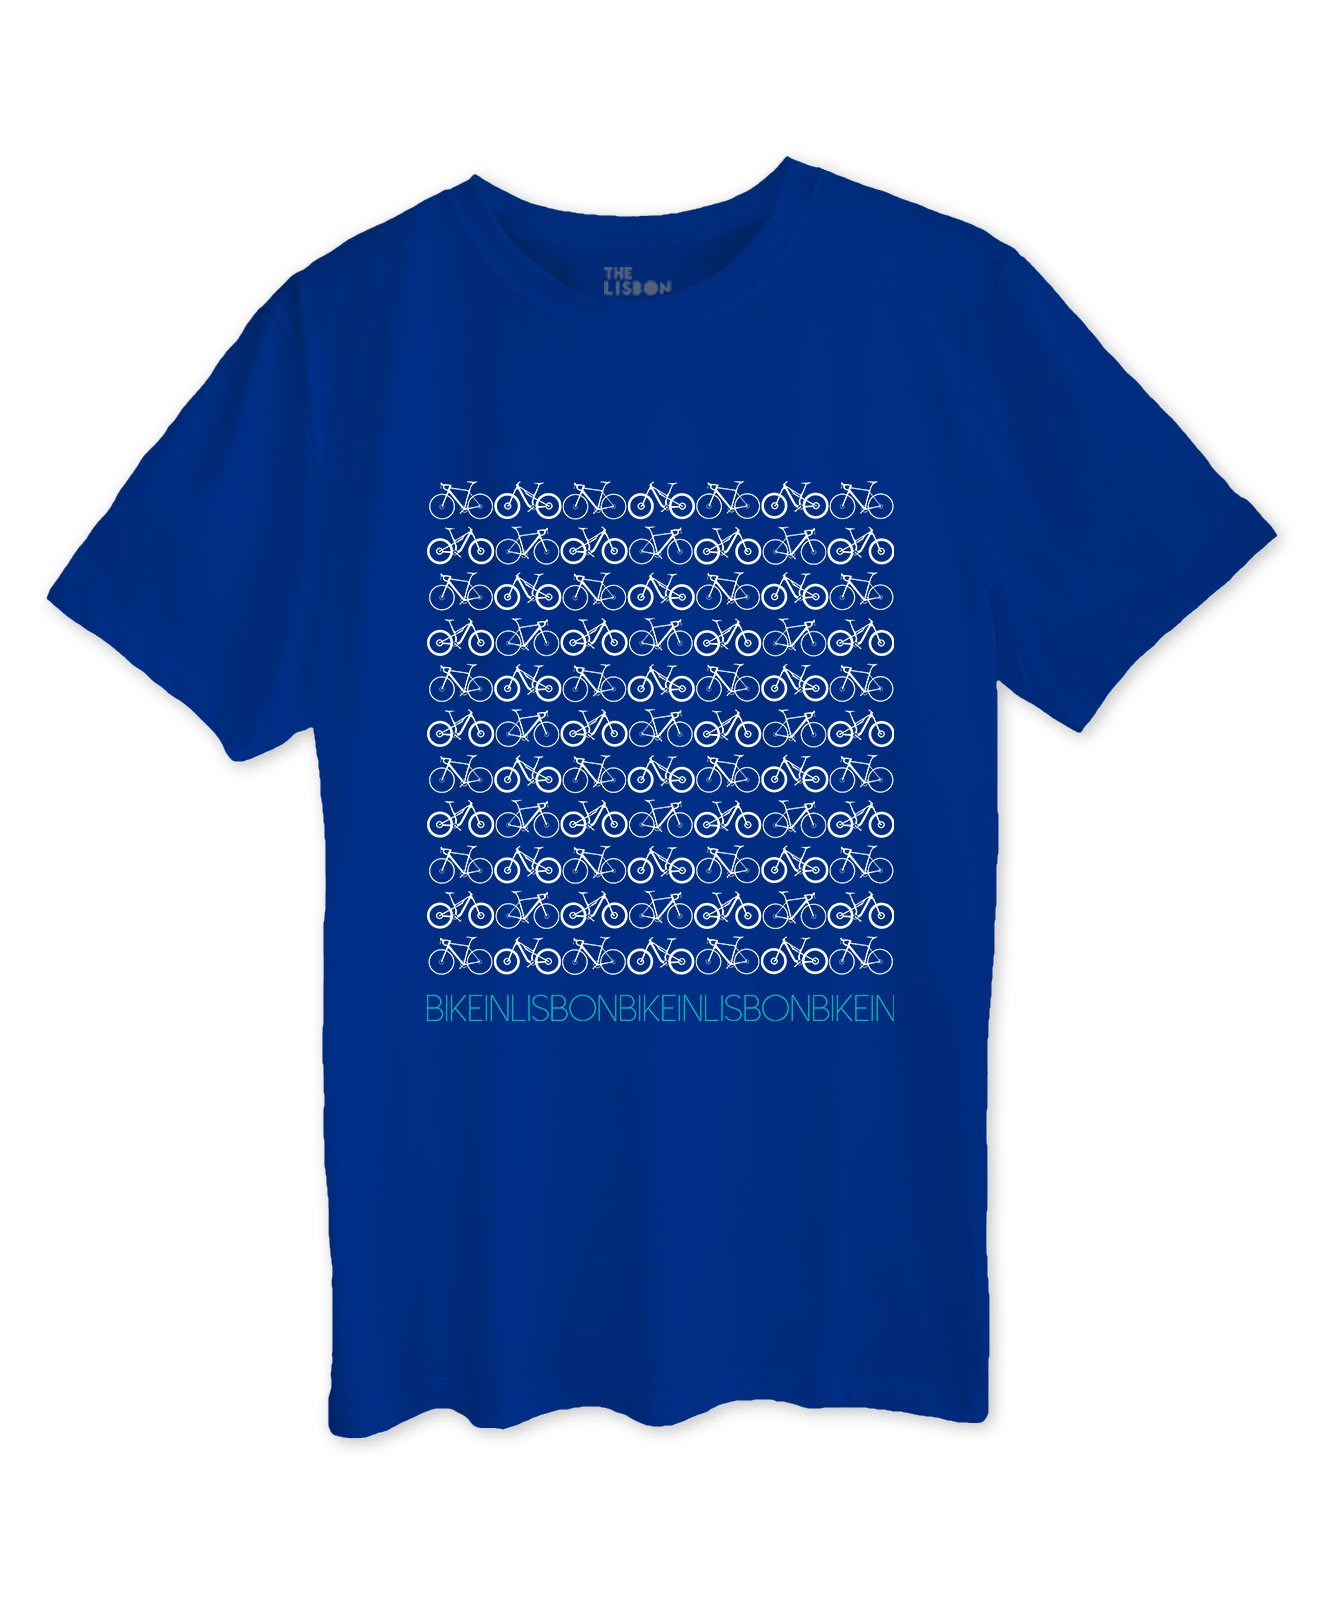 Bike in Lisbon Royal Blue T-shirt white printing